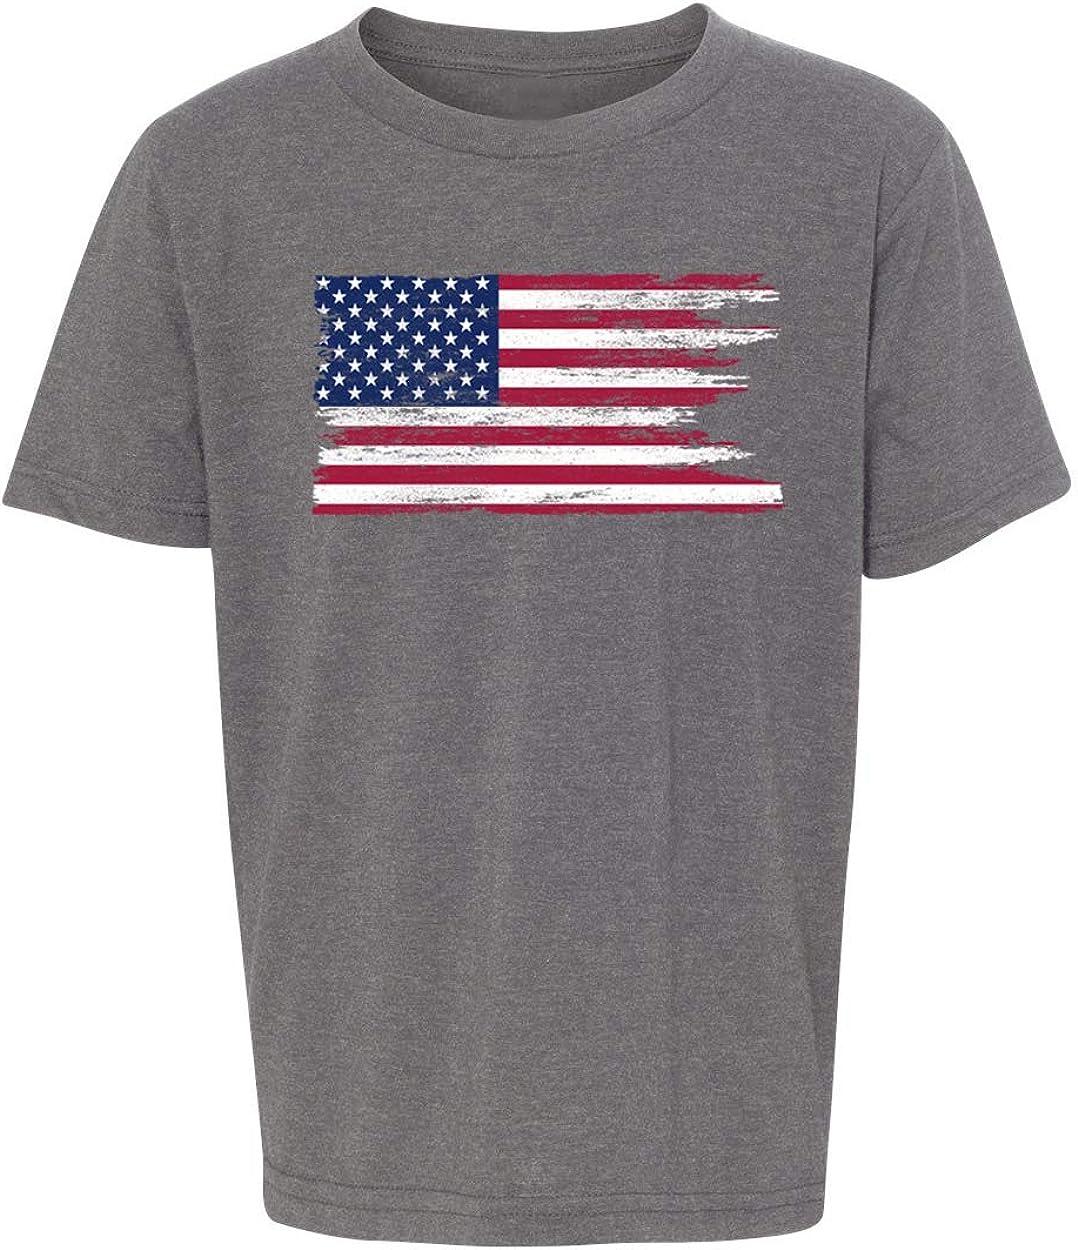 Patriotic Shirts Graphic T-Shirts for Kids Mato /& Hash American Flag T-Shirt